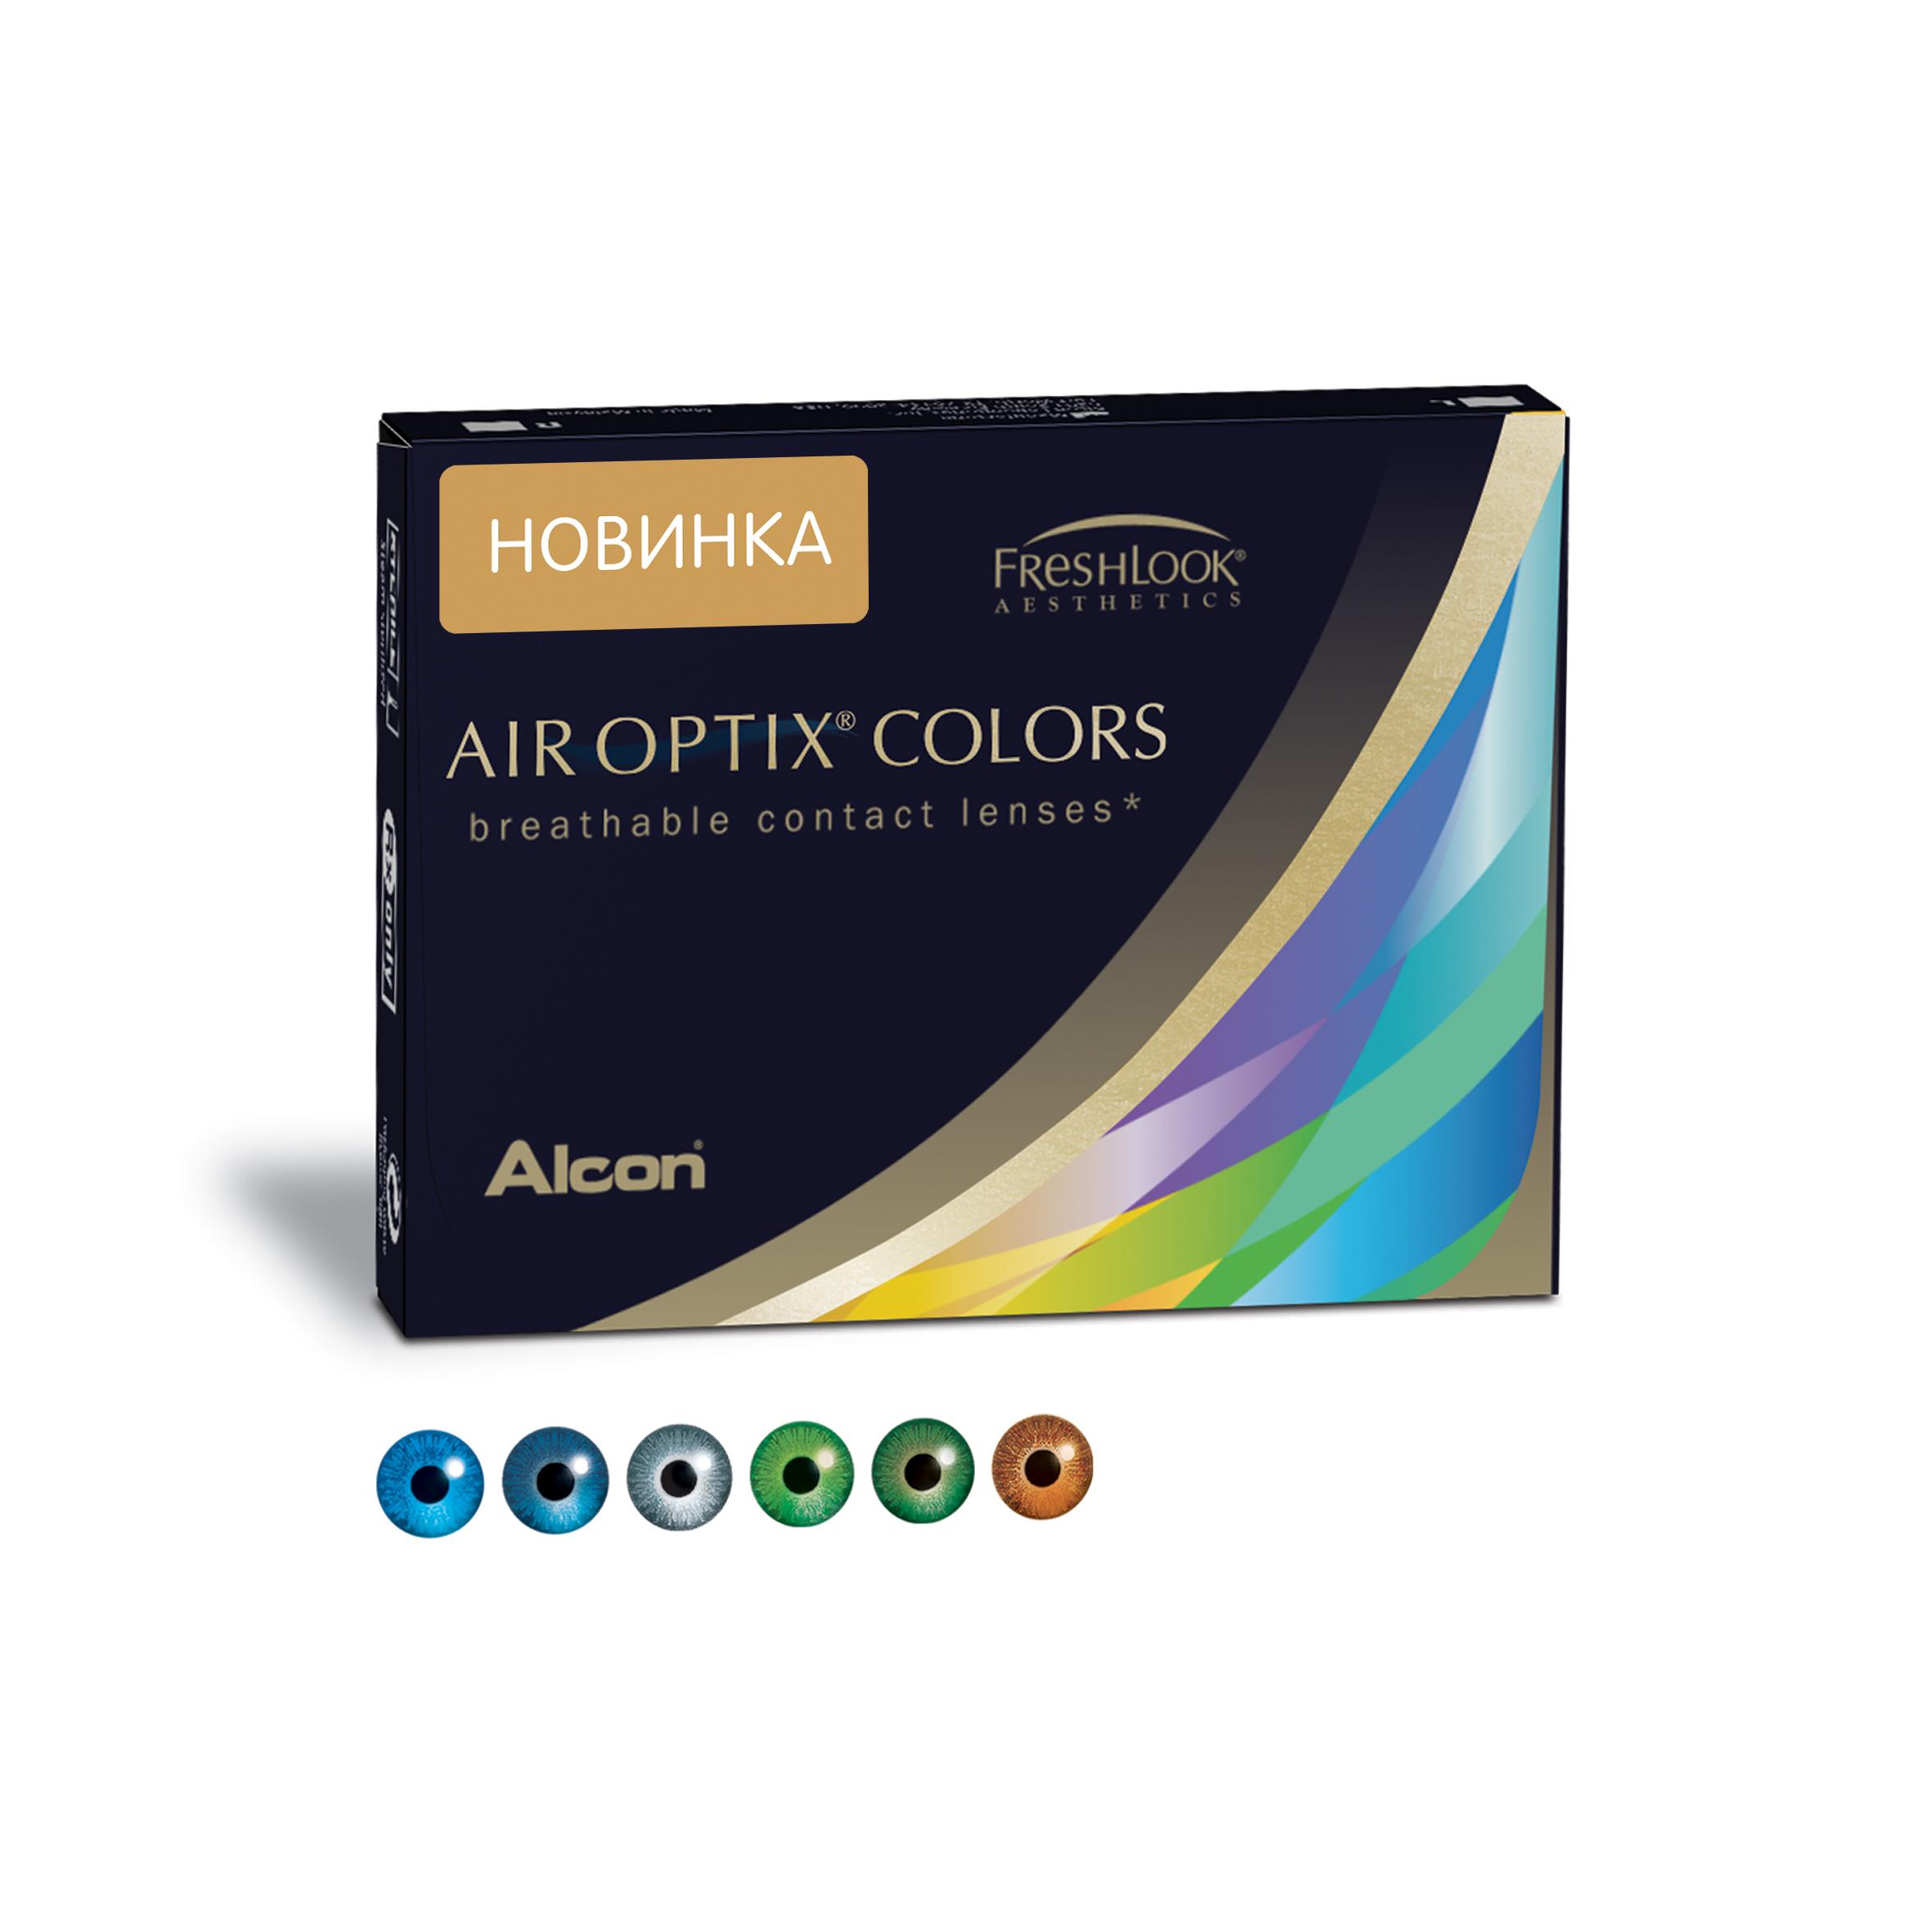 Аlcon контактные линзы Air Optix Colors 2 шт -0.25 Sterling Gray31746102Мягкие контактные линзы